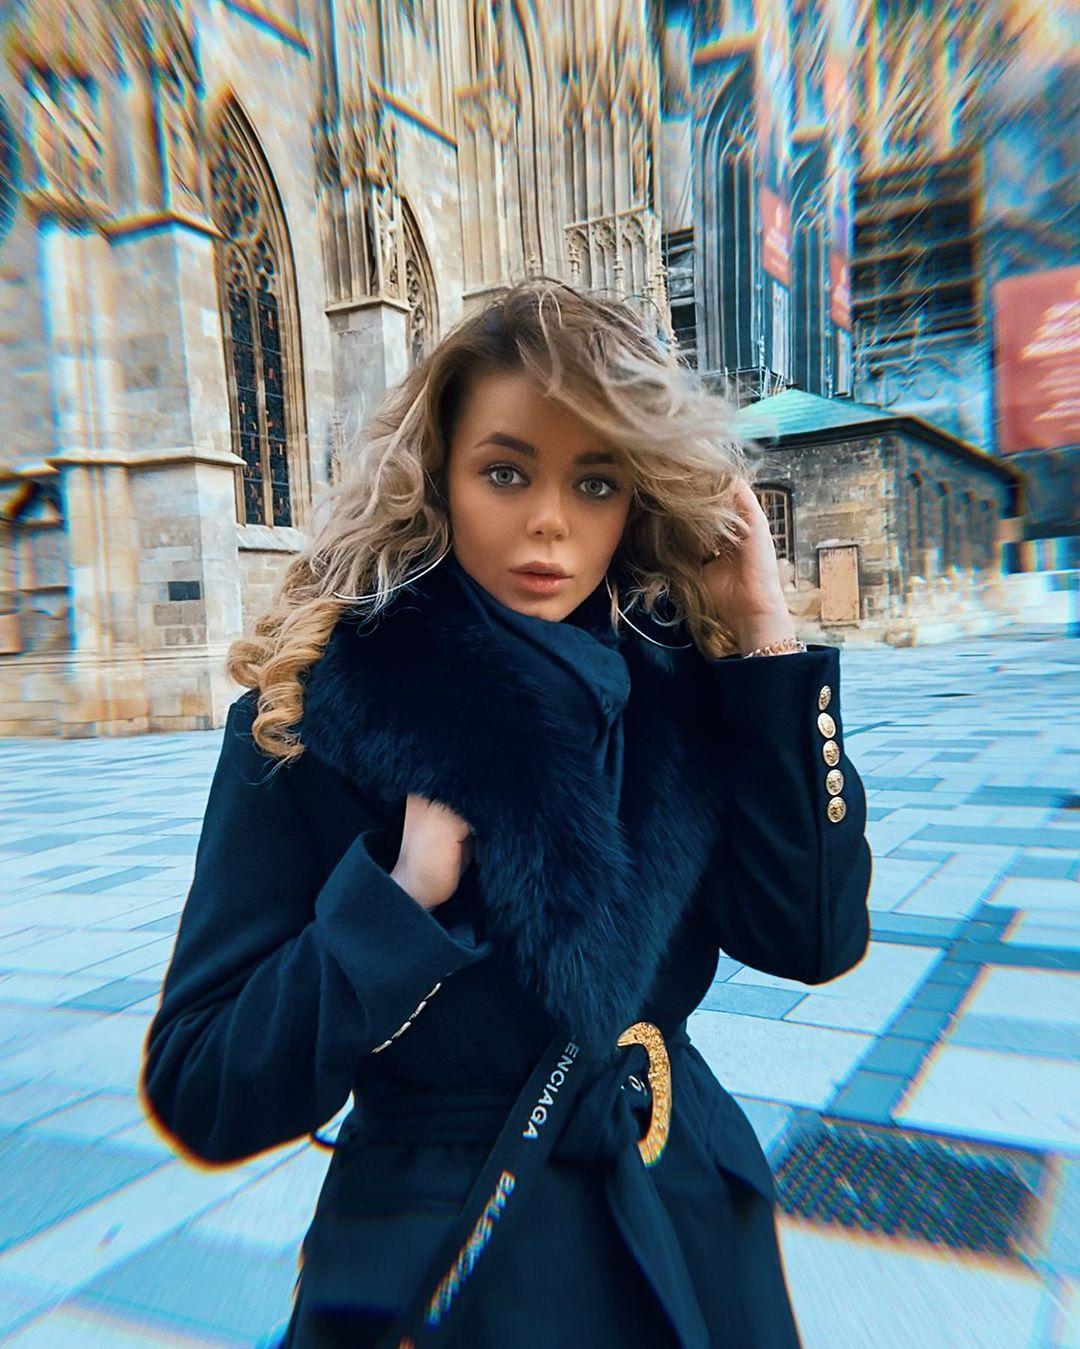 Співачка Аліна Гросу / фото: Аліна Гросу / Instagram